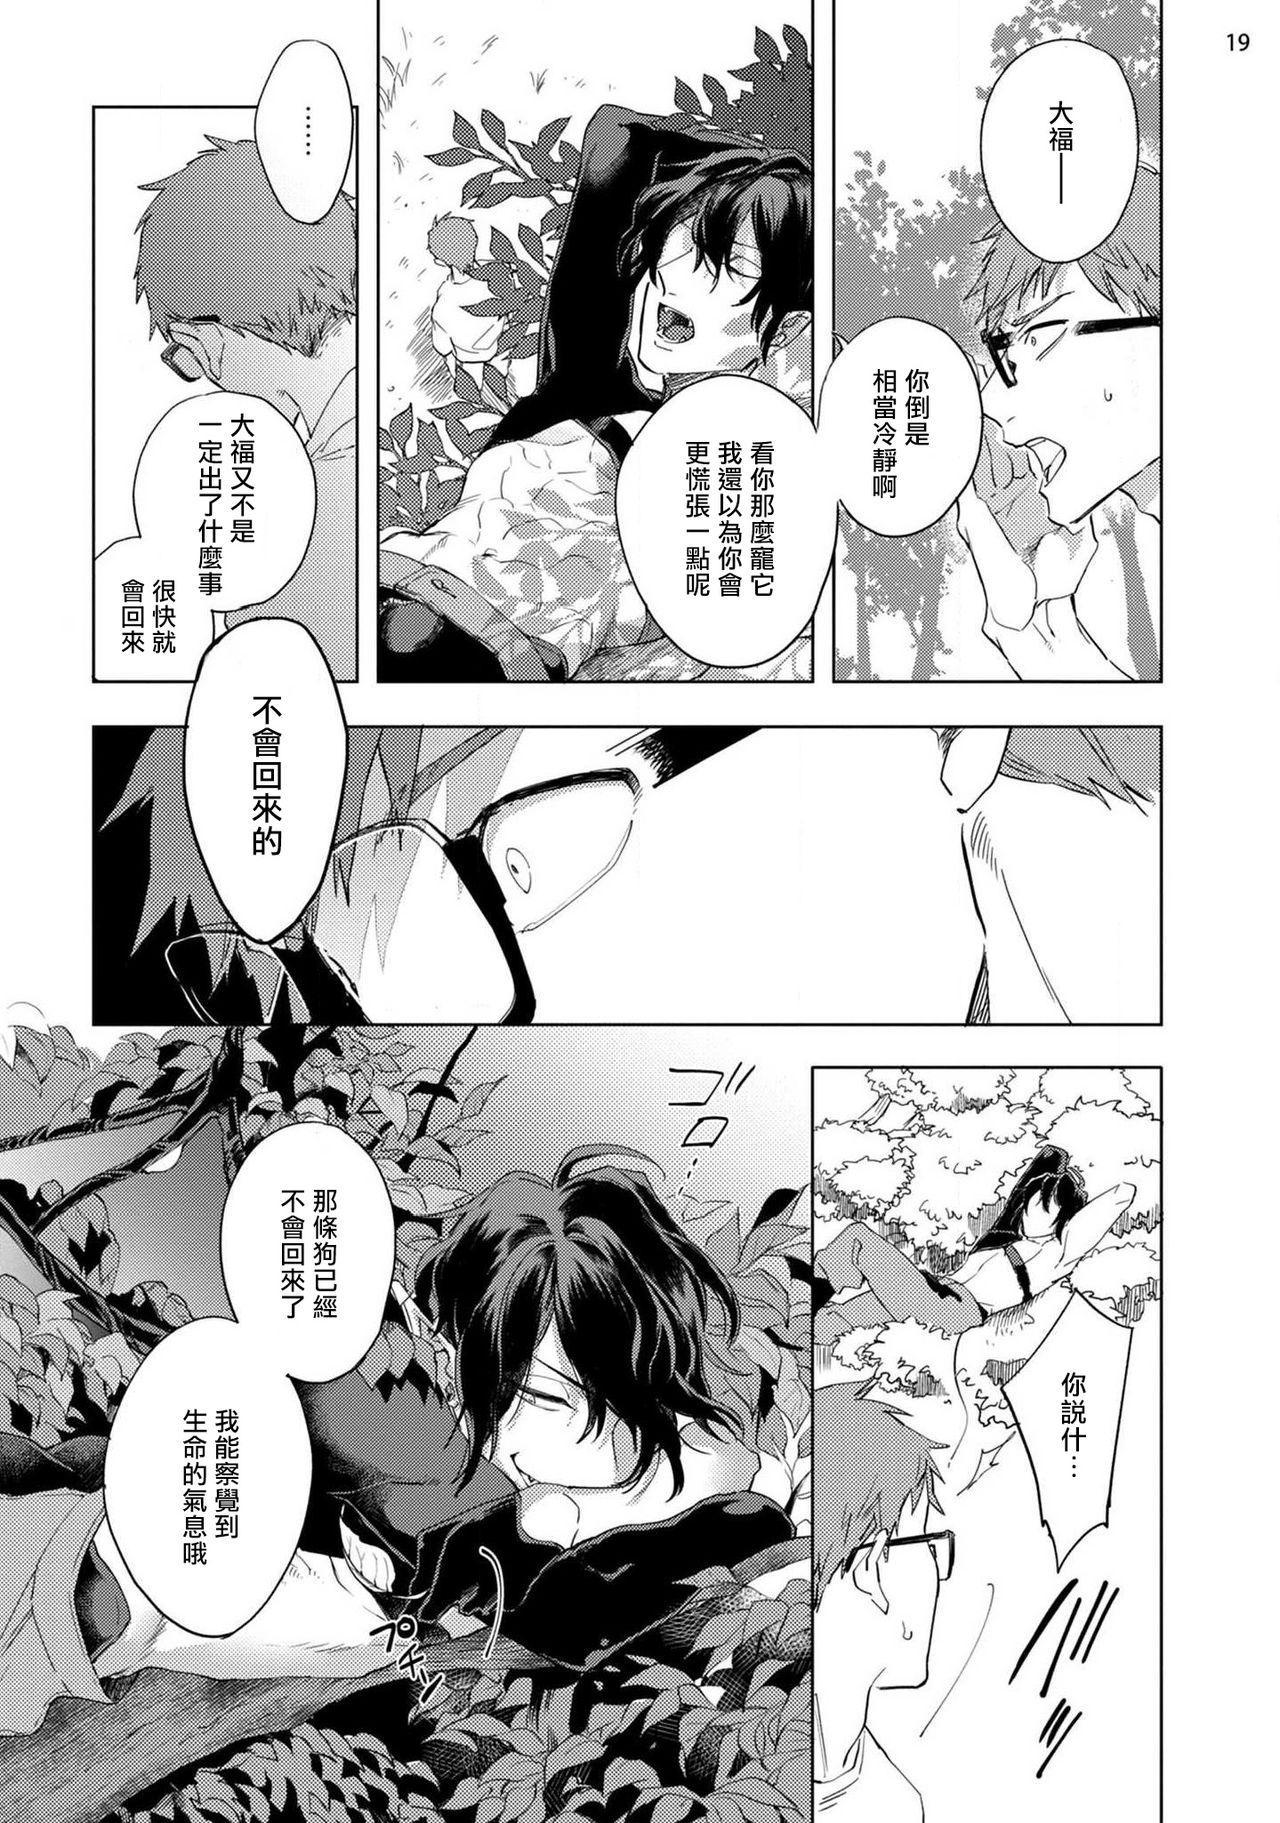 [Yao] Inma-sama ni Hallelujah!   赞美淫魔大人! Ch. 1-3 [Chinese] [拾荒者汉化组] [Digital] 89